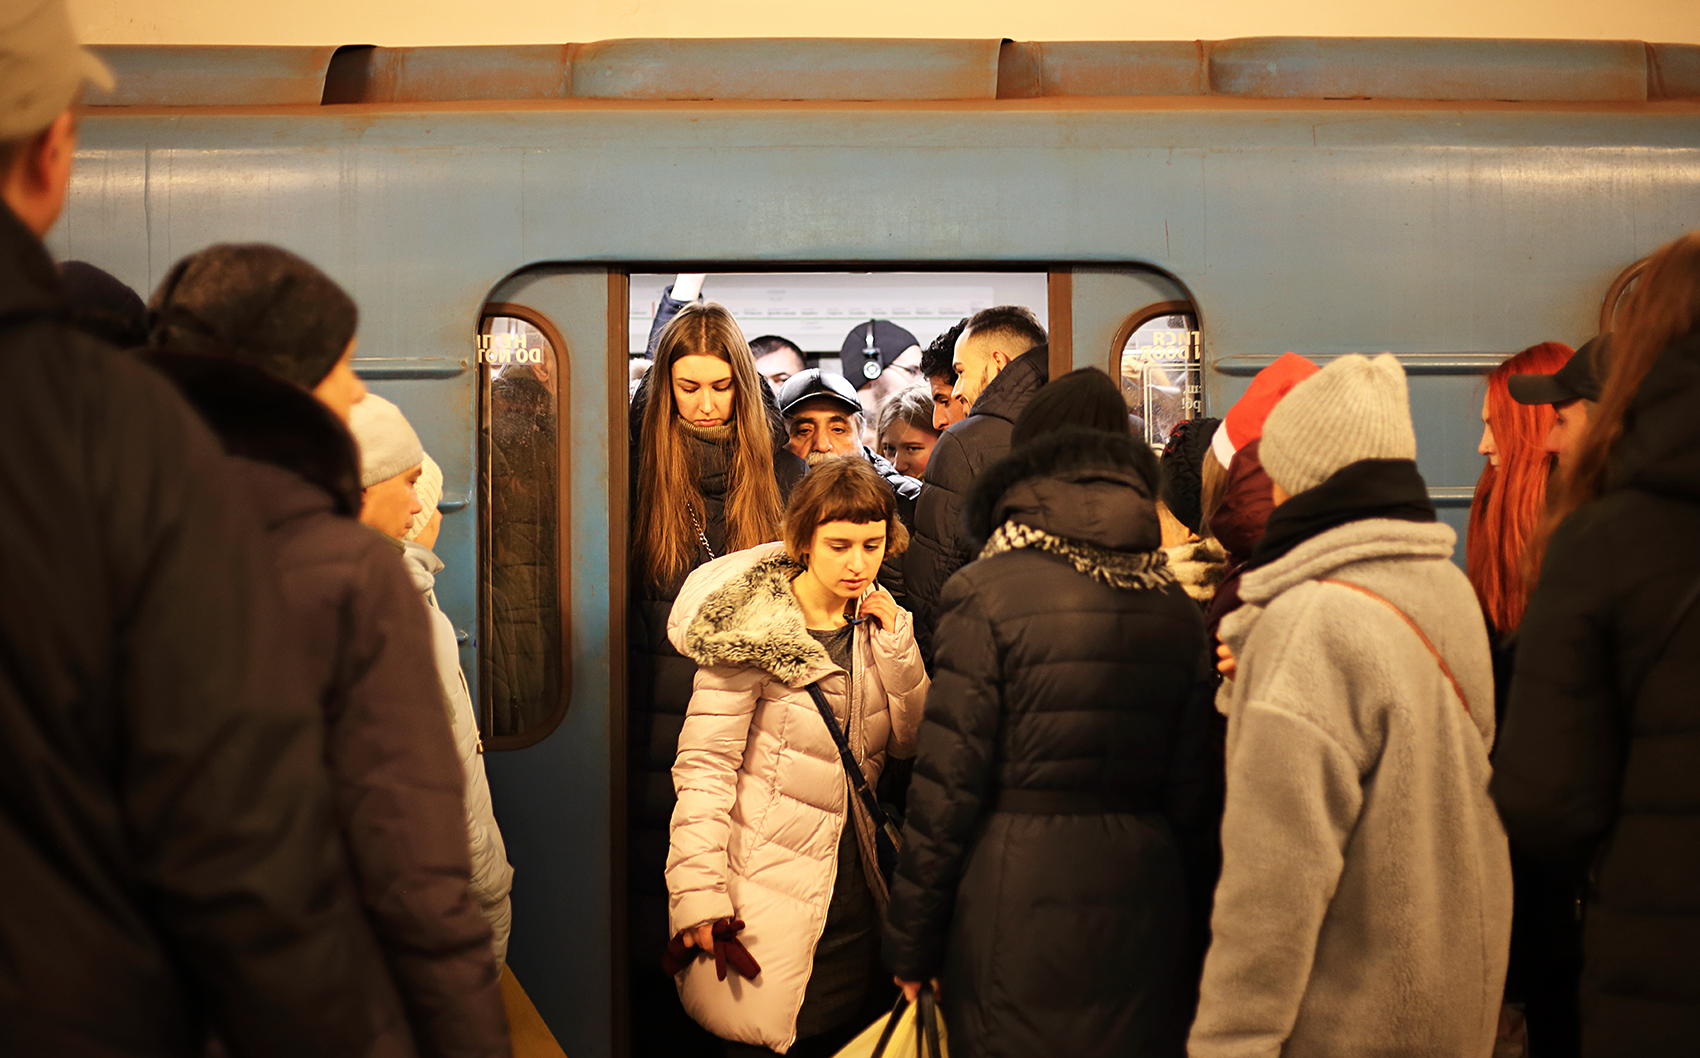 misure giuste S. Costa the metro